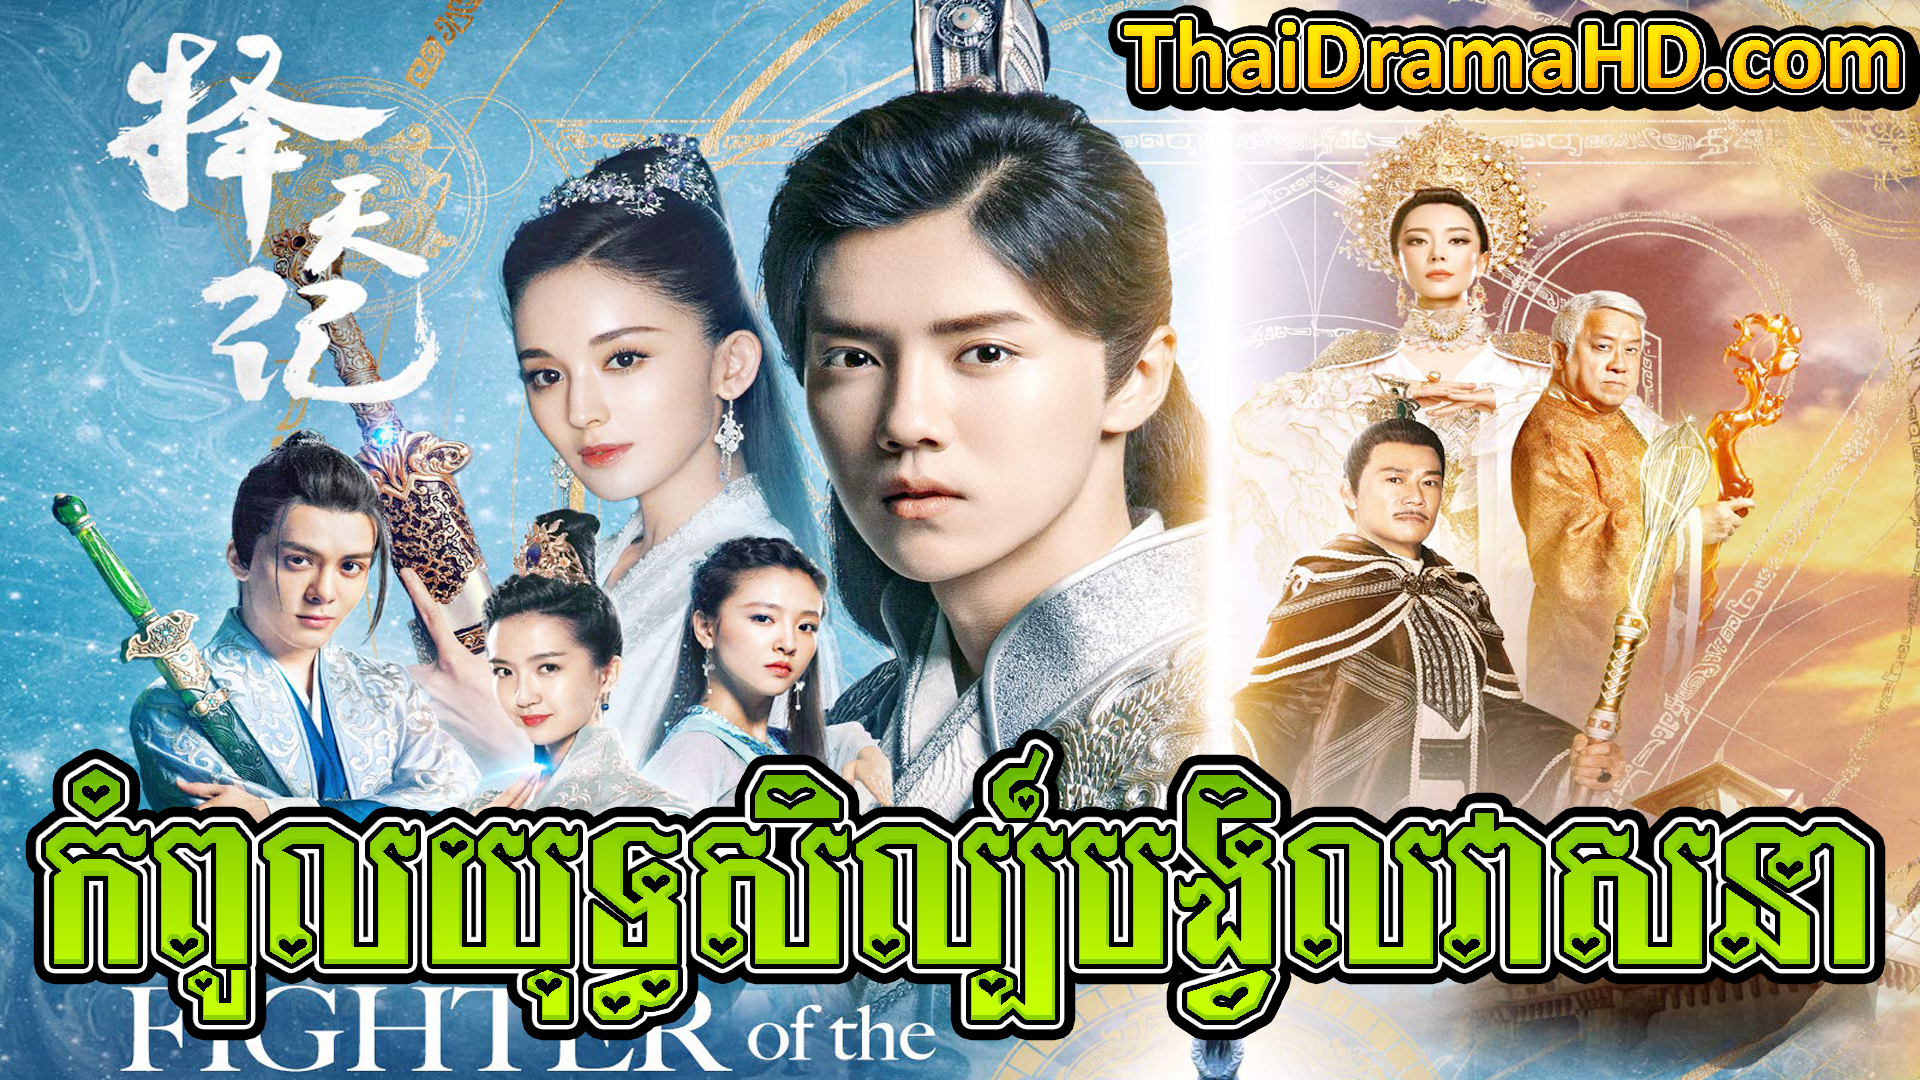 Kampoul Yuthsil Bangvel Veasna | Thai Drama | Khmer Movie | Phumikhmer | movie-khmer | video4khmer | khmotions | kolabkhmer | khmer drama | ksdrama | cookingtips | roscheat | khmertimeskh | khmerkomsan | phumi7 | merlkon | film2us | movie2kh | sweetdrama | khmercitylove | khreplay | tvb cambodia drama | ckh7 | srokthai | phumimedia | phumi8 | khmer avenue | khmer search | Soyo | khmerfans